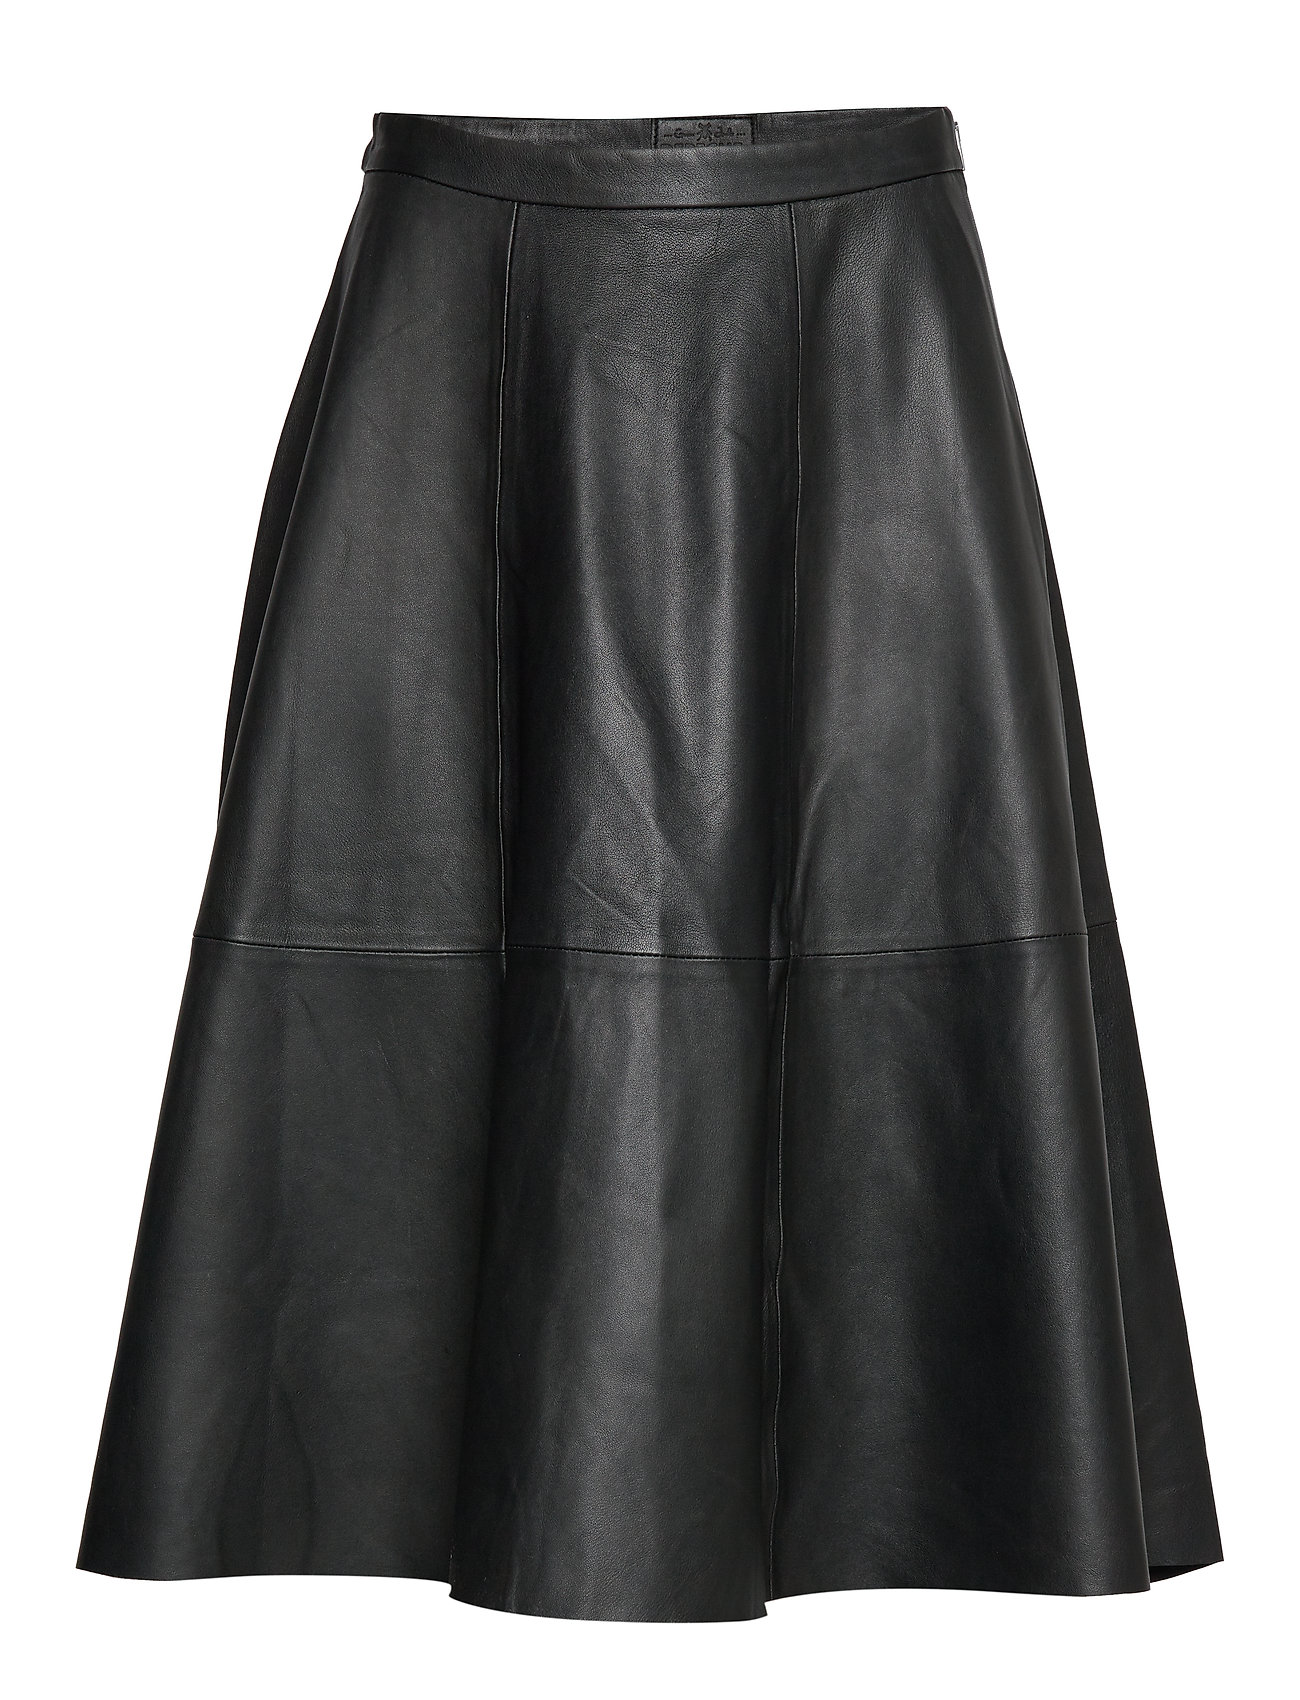 DEPECHE A-skirt - BLACK (NERO)